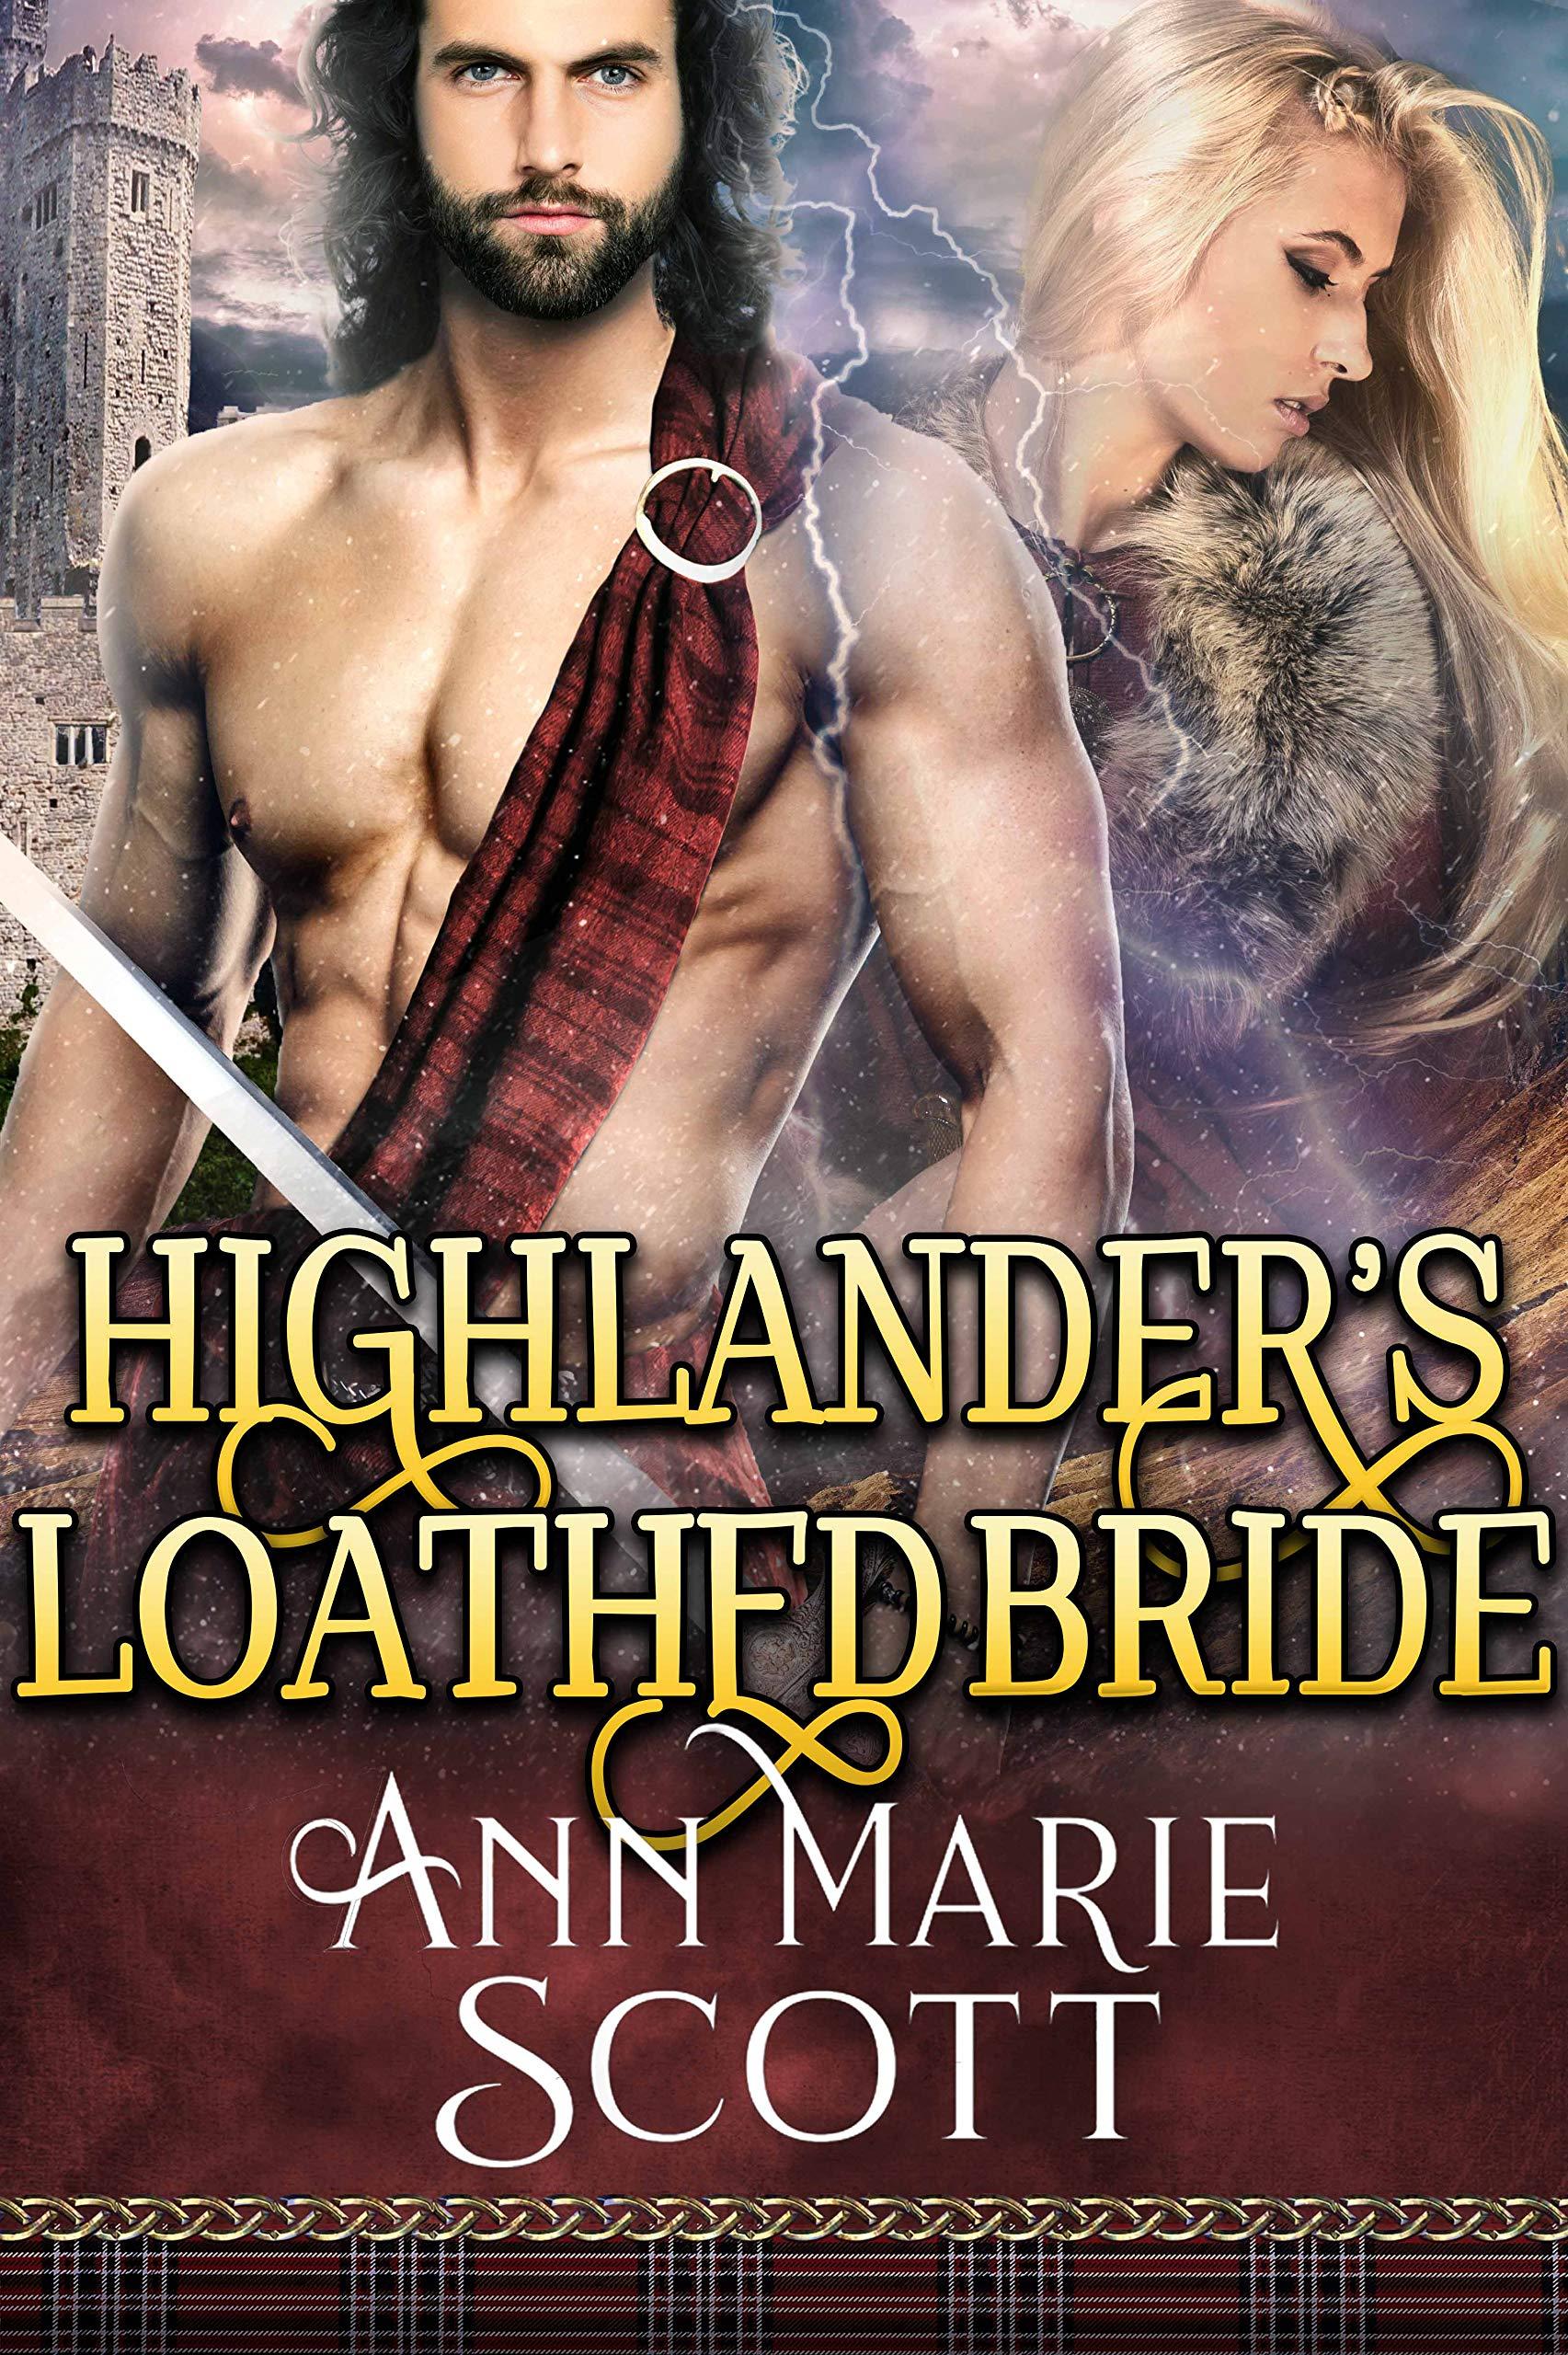 Highlander's Loathed Bride: A Steamy Scottish Medieval Historical Romance (Sassenach Brides Book 3)